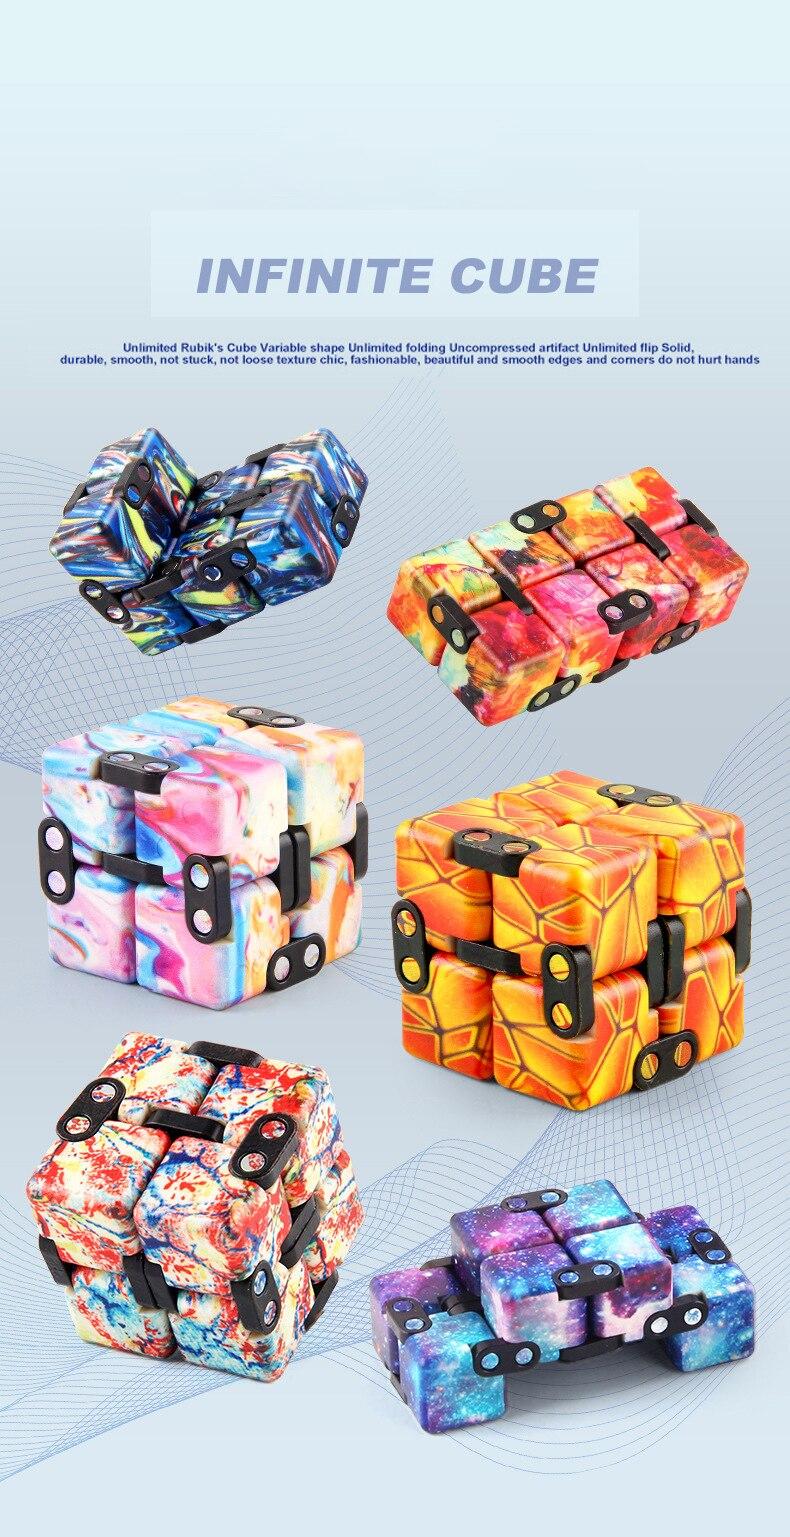 H2575fb49157241ad891c9b9a732c1687c - Infinity Cube Fidget